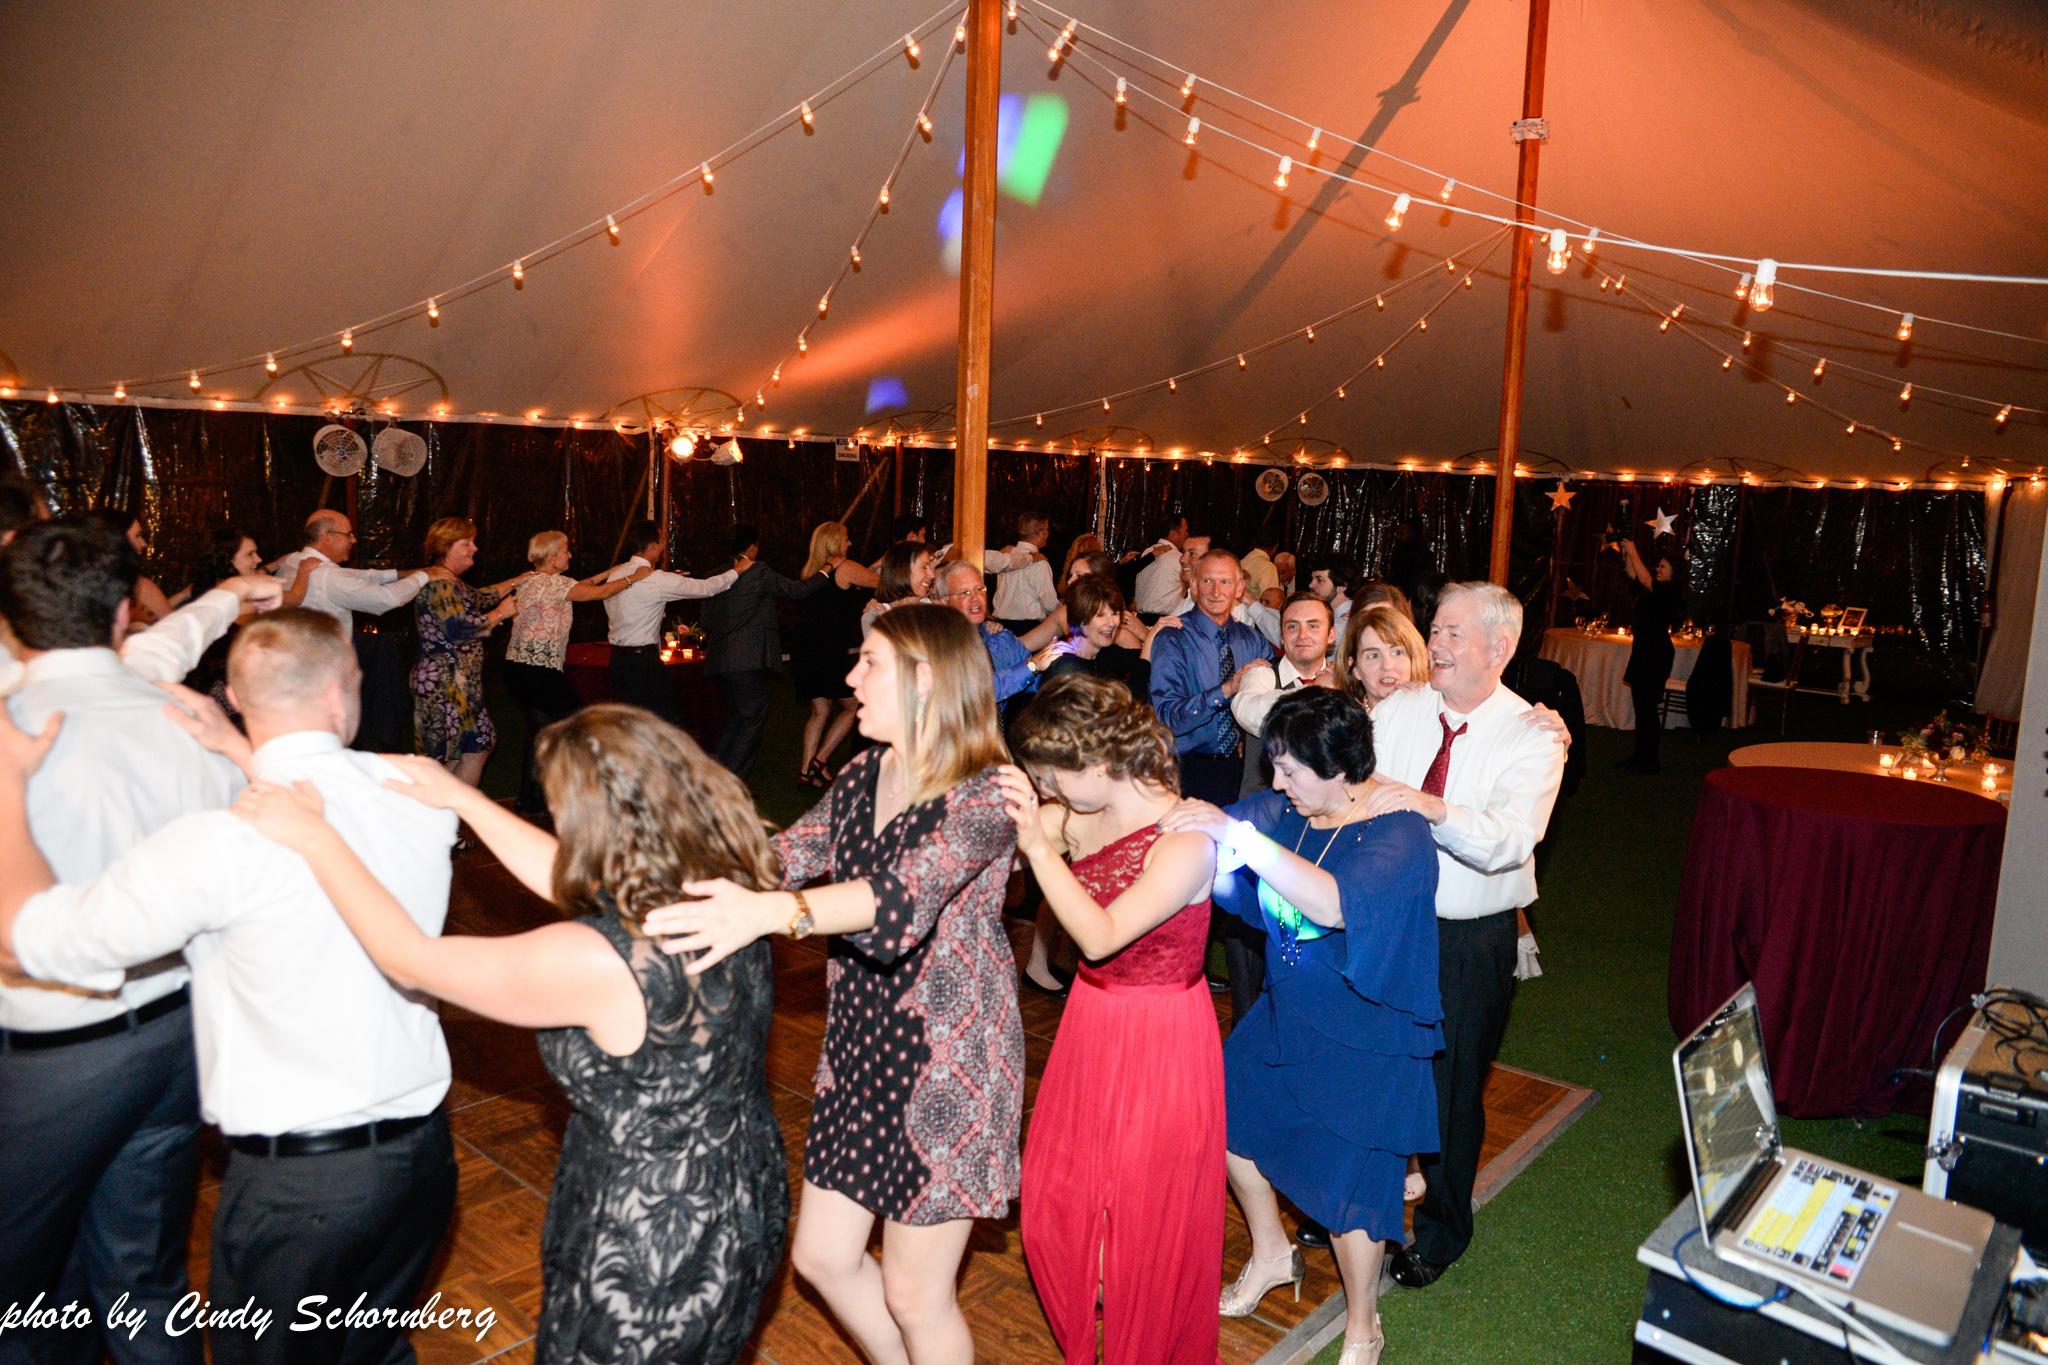 vineyard_weddings_Charlottesville_Virginia_016.jpg